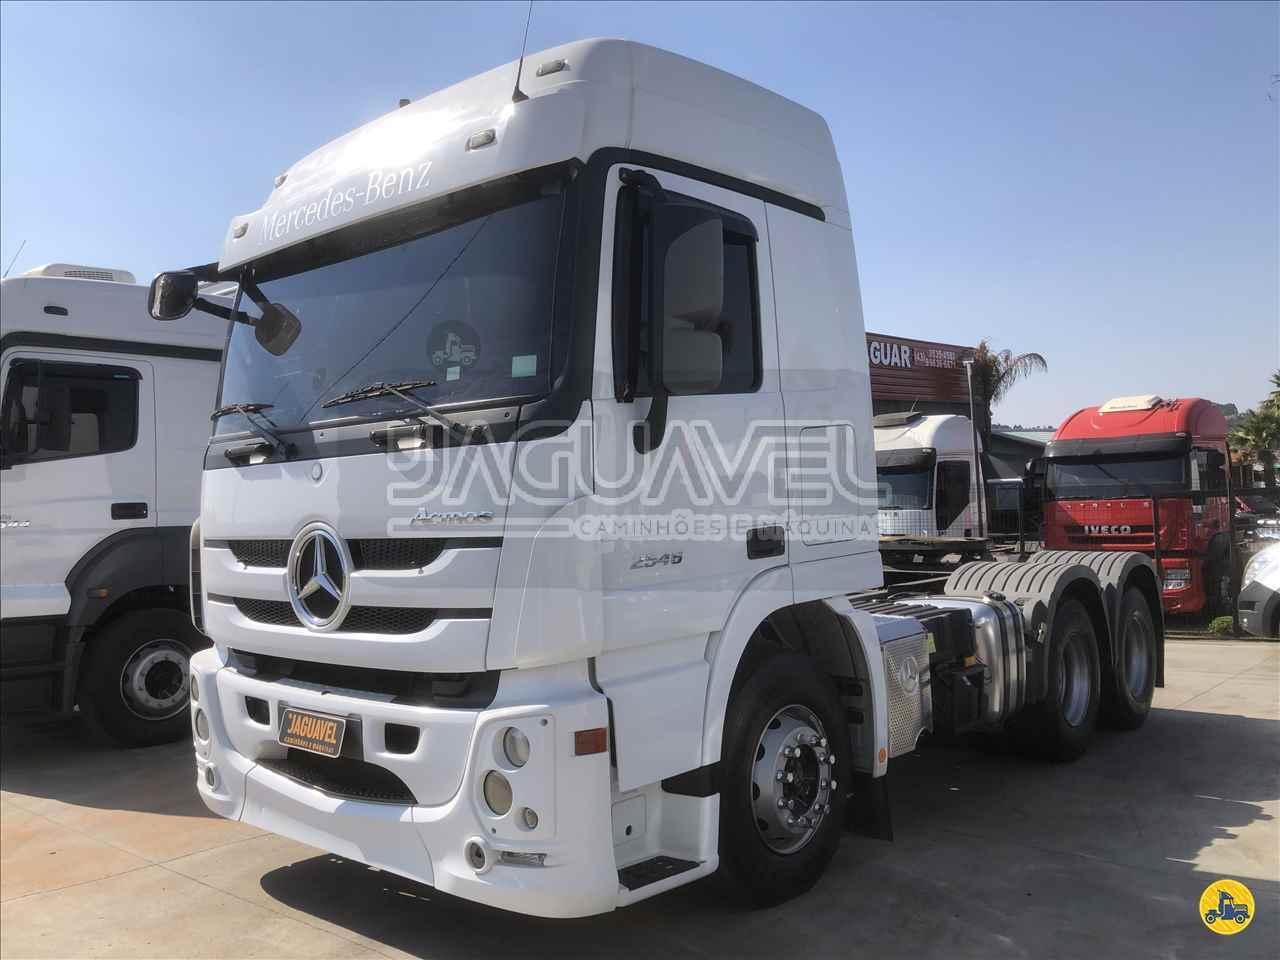 MB 2546 de Jaguavel Caminhões - JAGUARIAIVA/PR